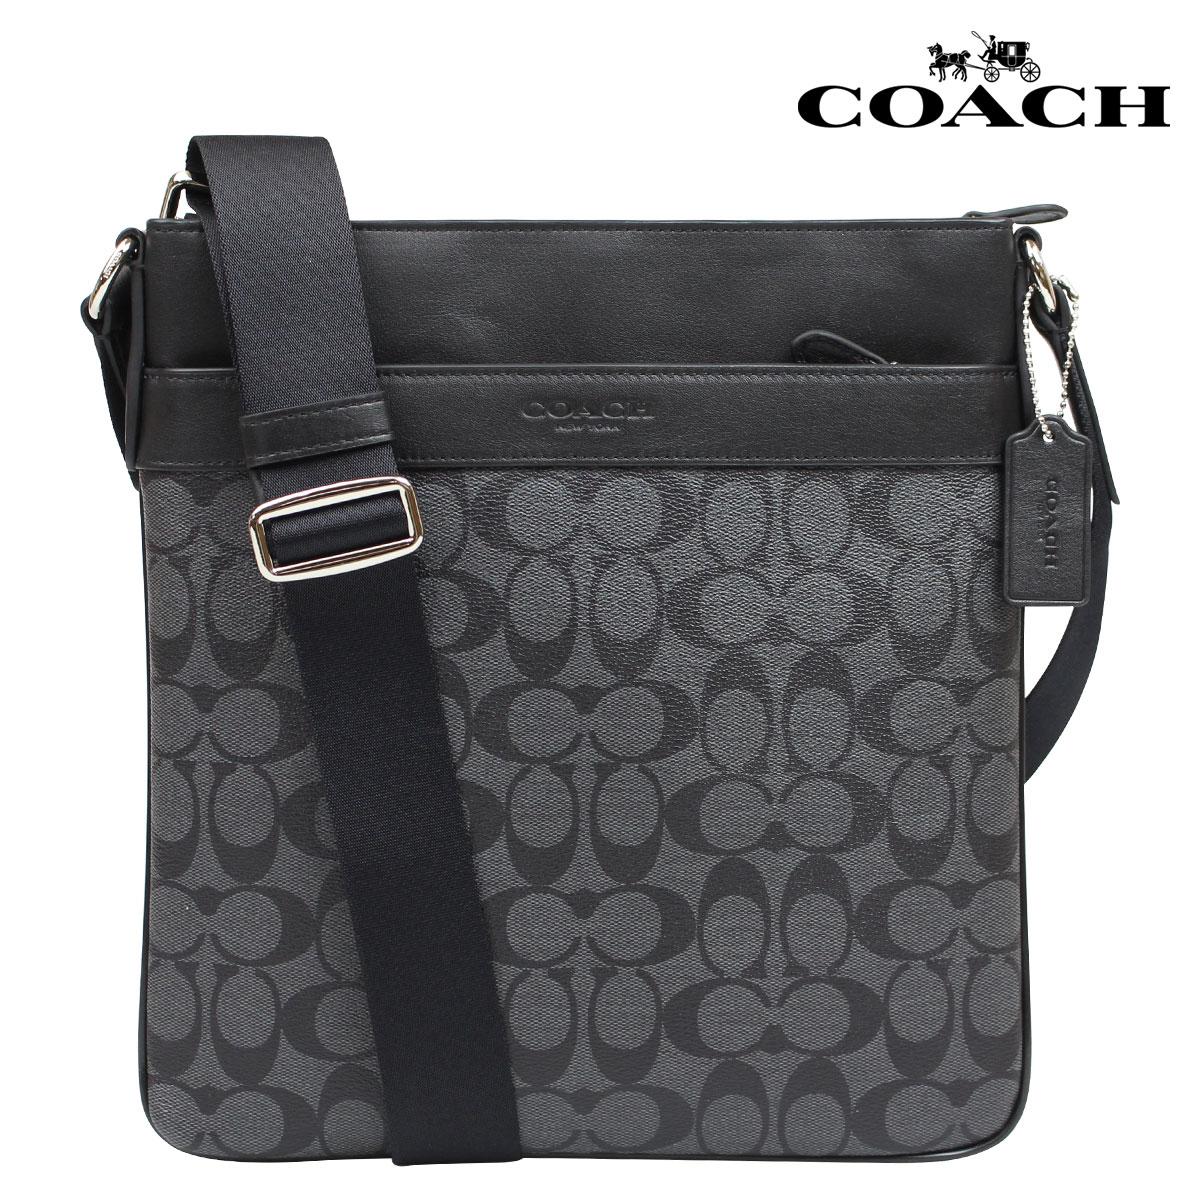 Coach Bag Shoulder Bags Mens F71877 Charcoal Black Bowery Signature Cross Body